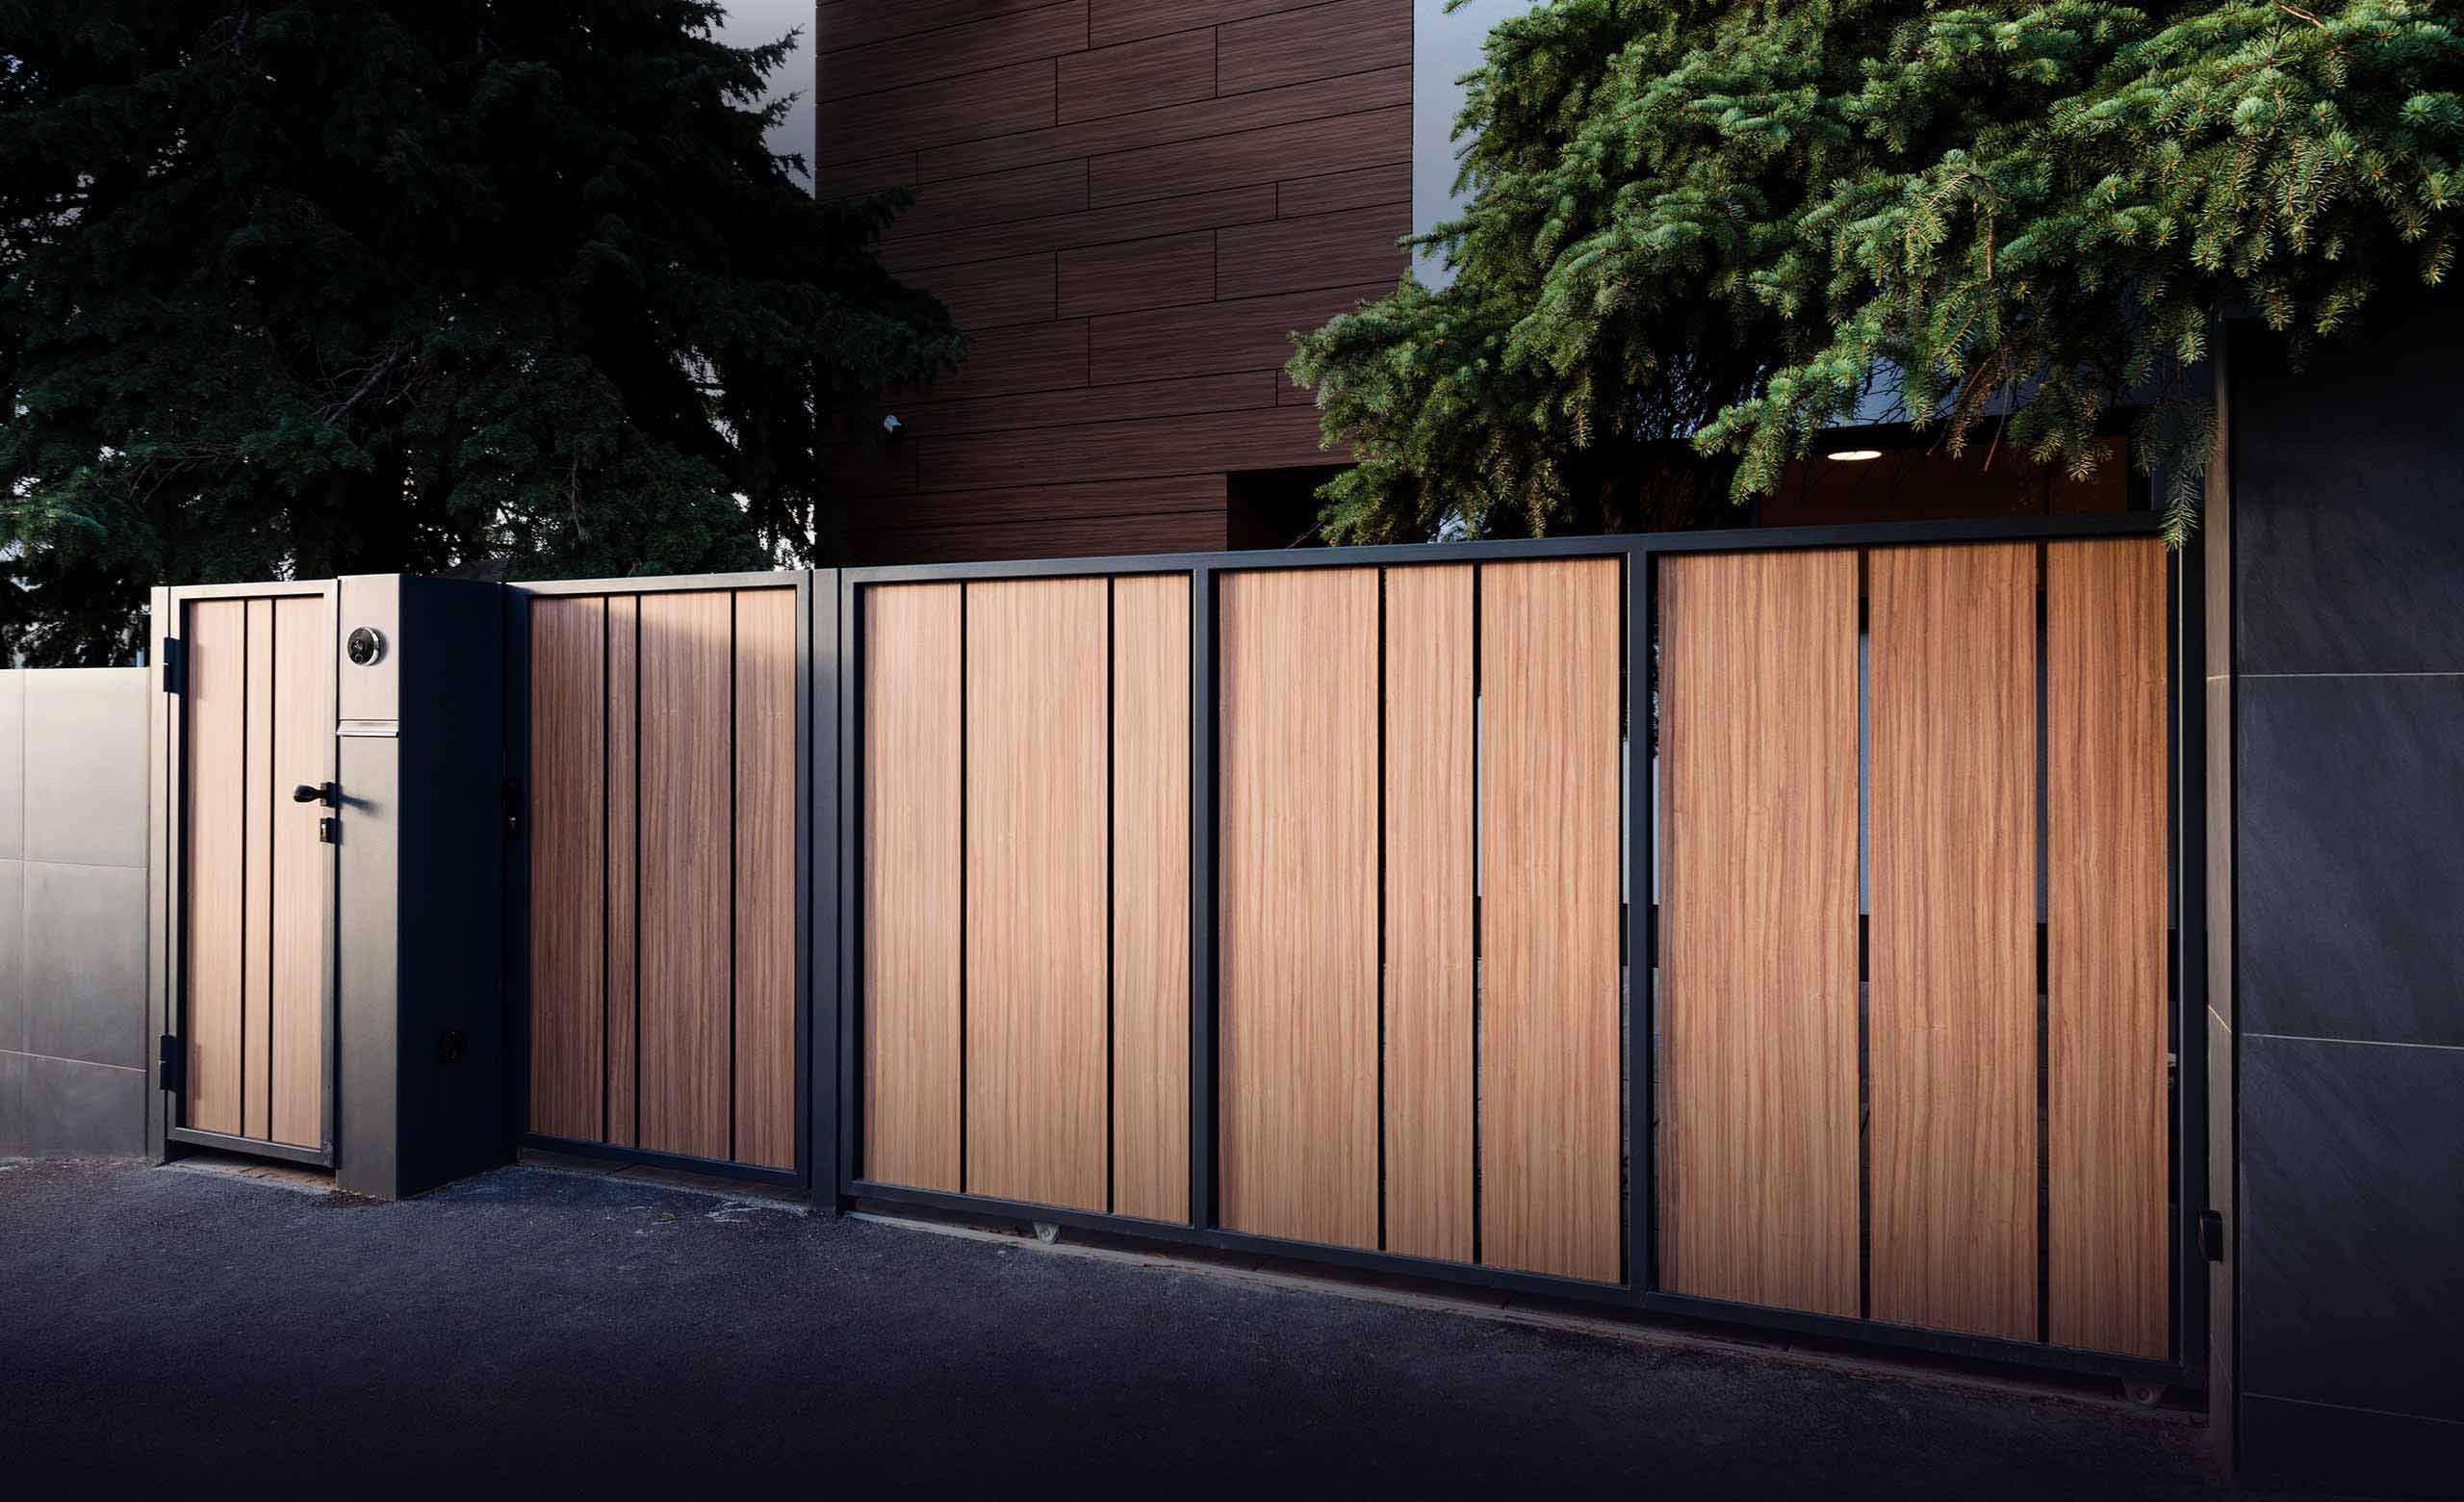 Managing gates and roller blinds with no effort